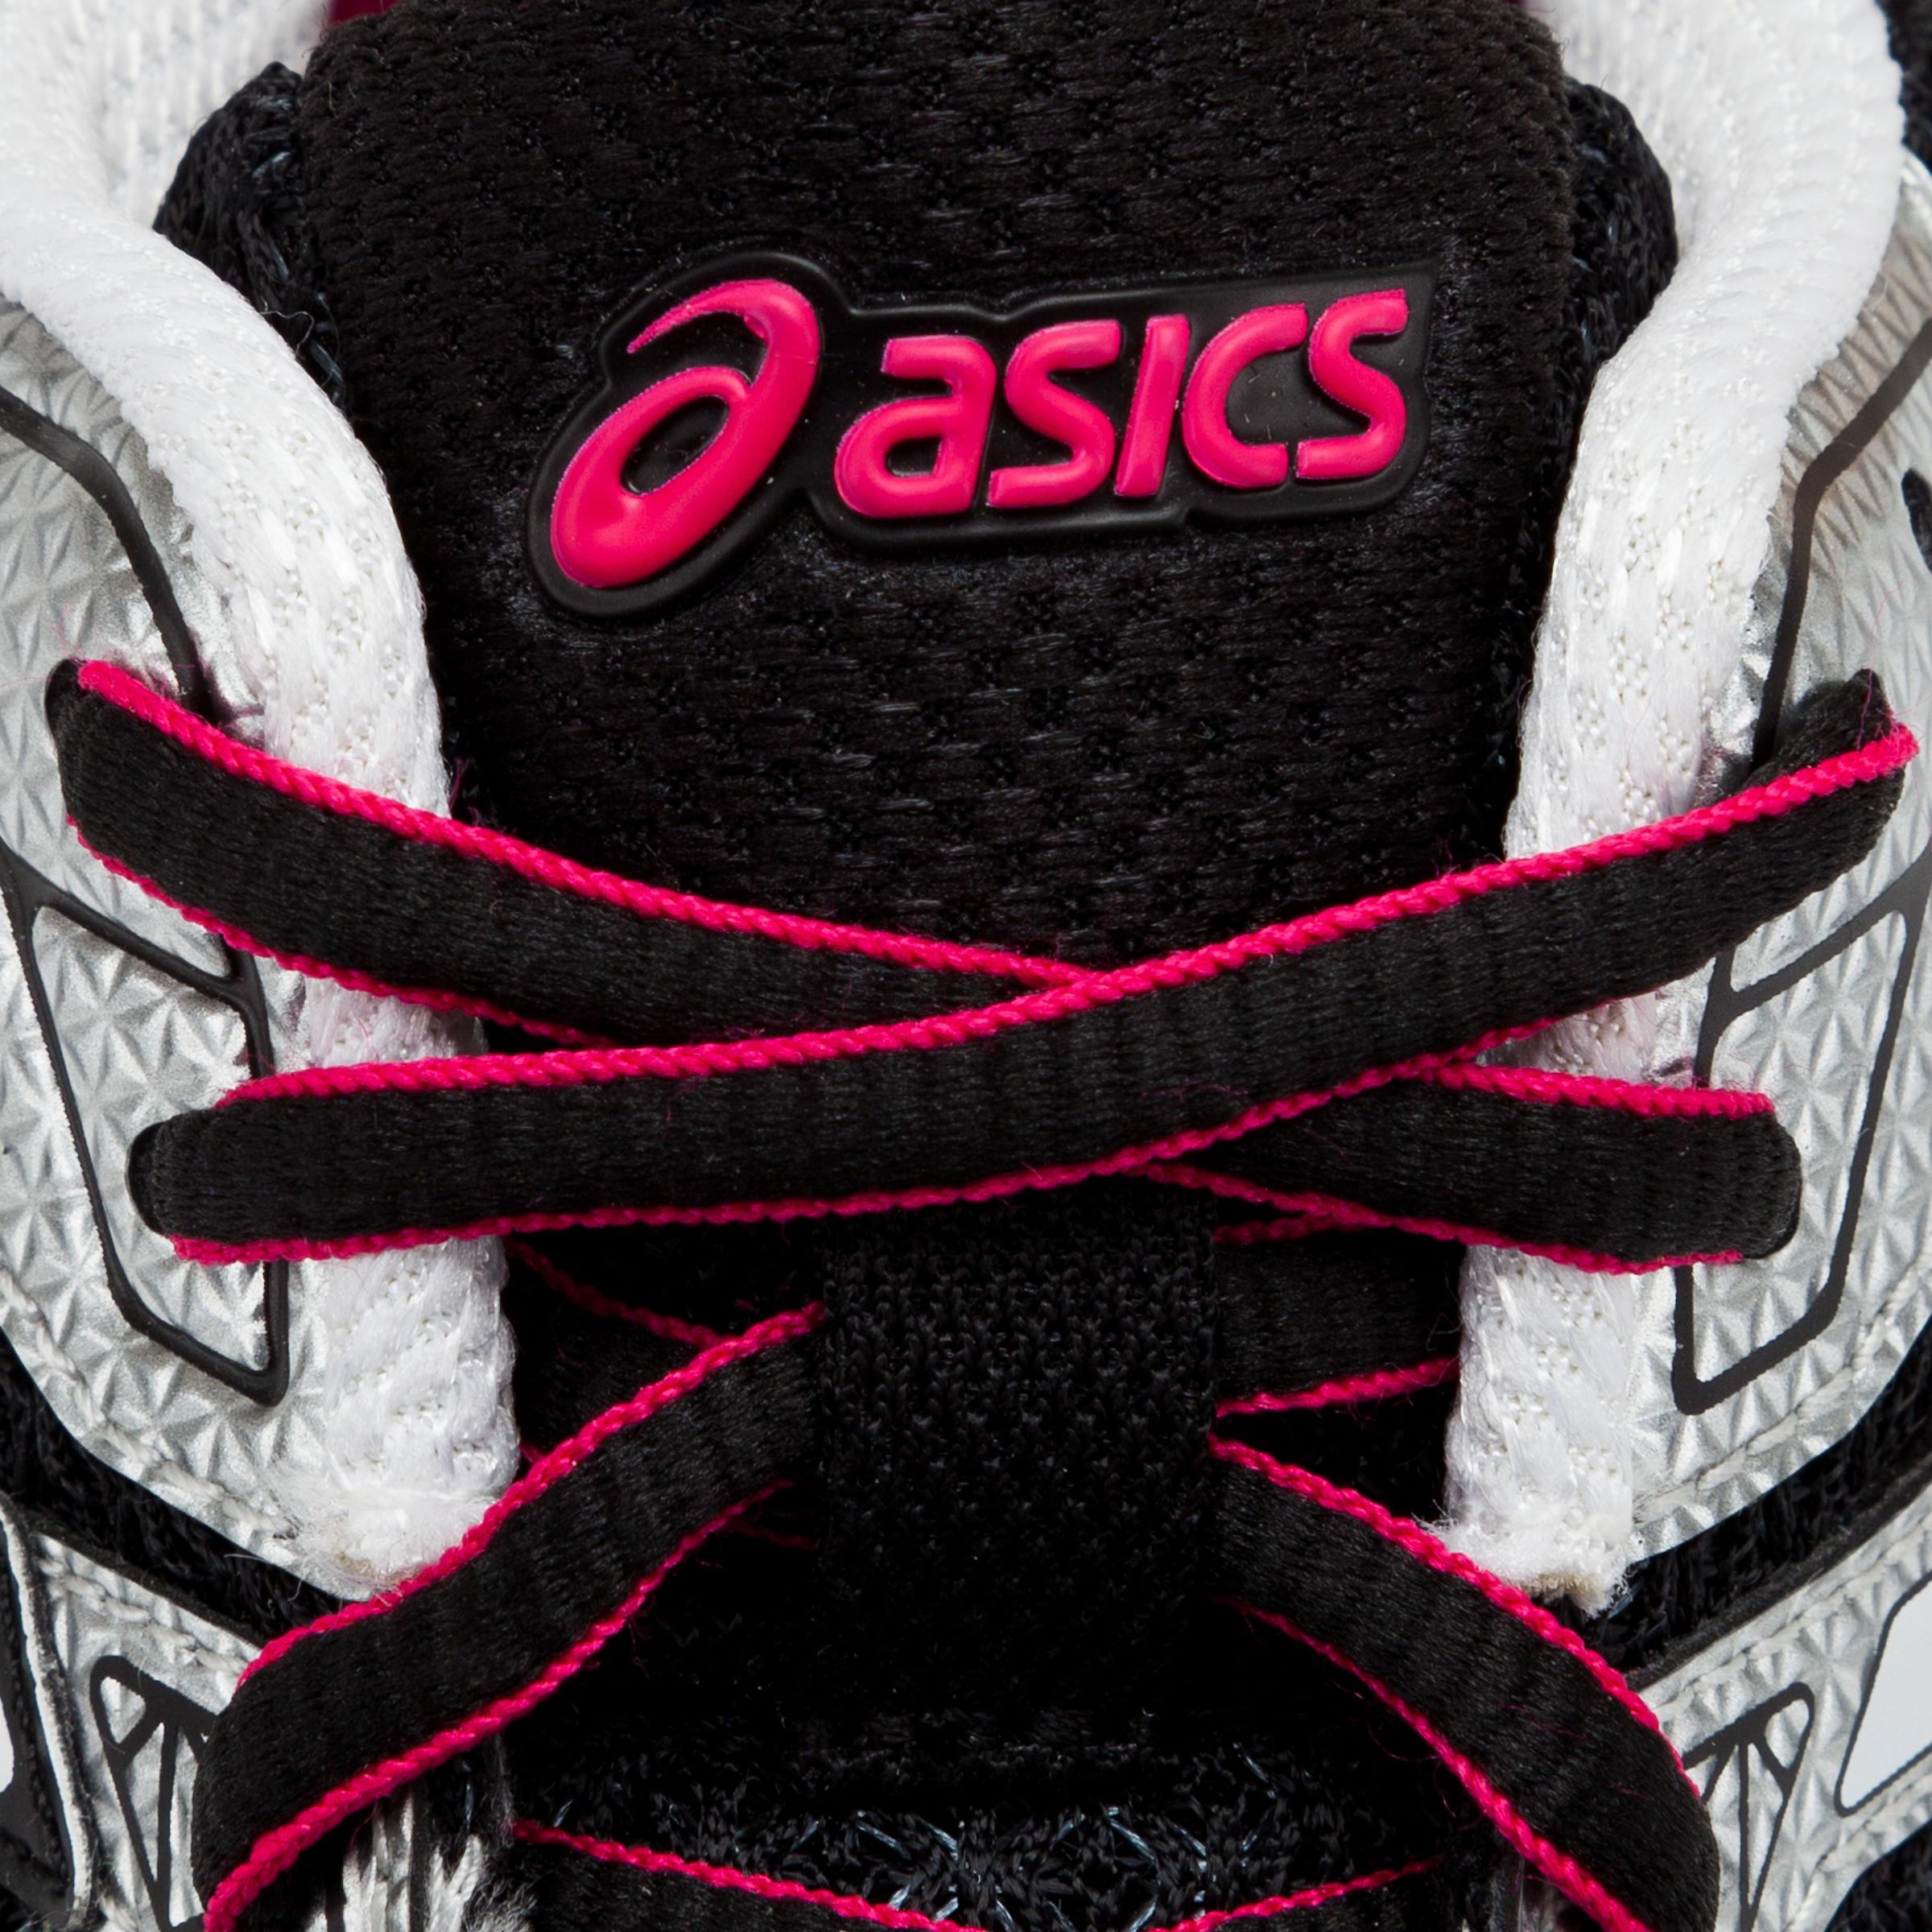 Running Chaussures Gel 0wonp8k Femme Runmiles Asics 8wNn0mv